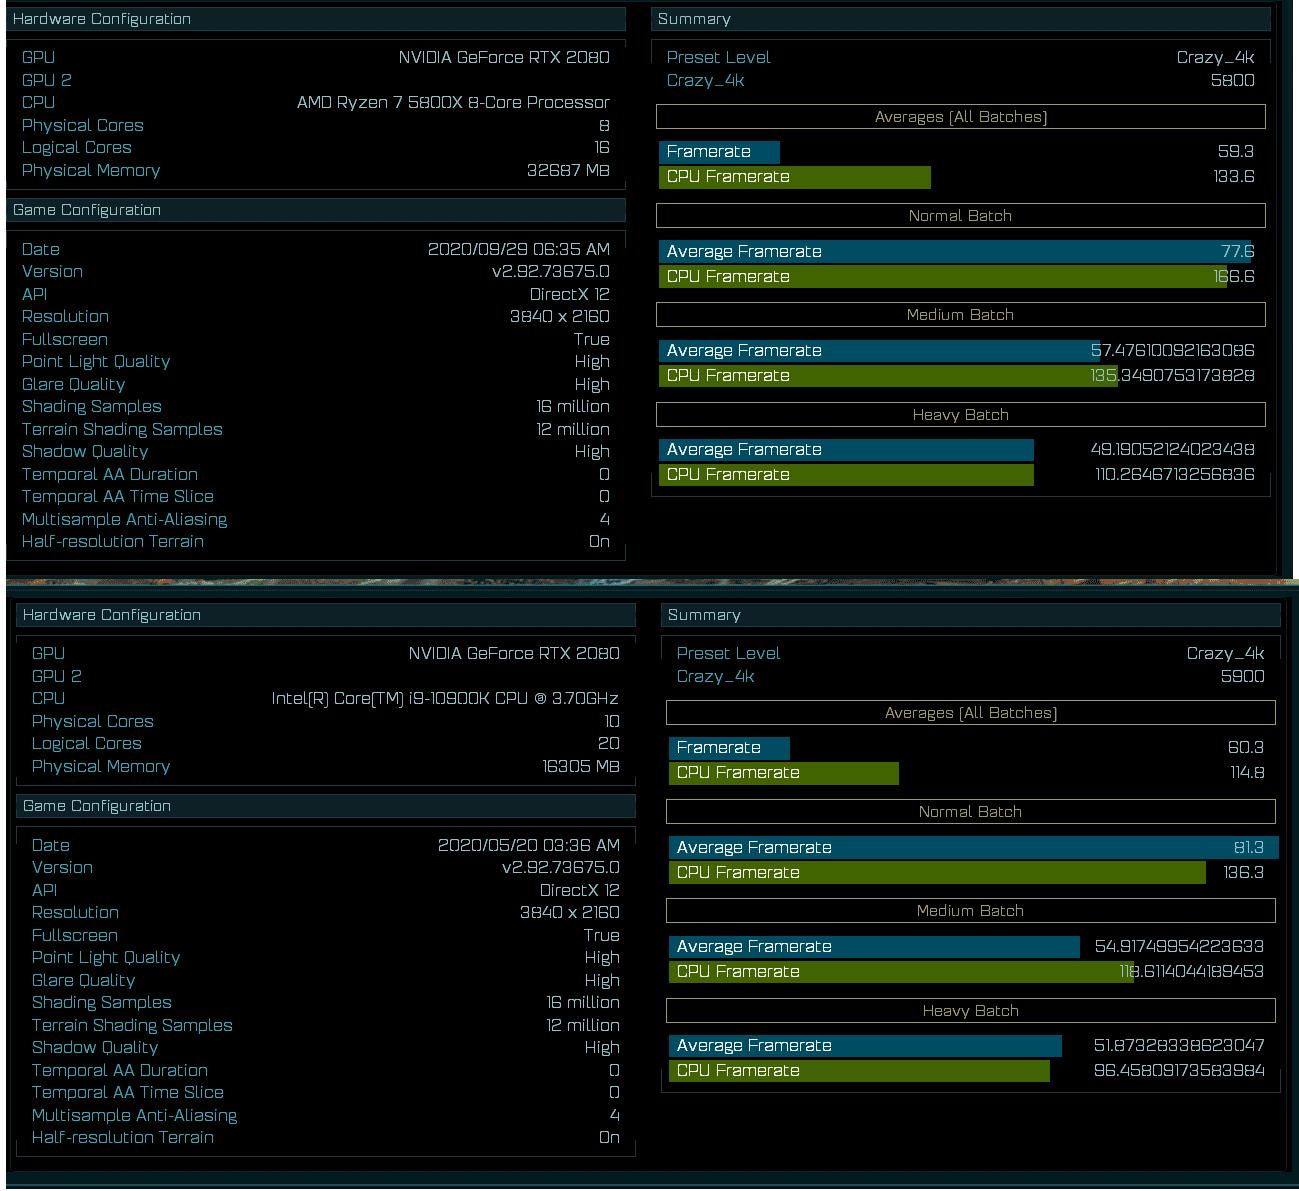 EjDiQzaVkAU9 Qy بنچمارک پردازنده Ryzen 7 5800X فاش شد؛ سریعتر از i9 10900K اخبار IT